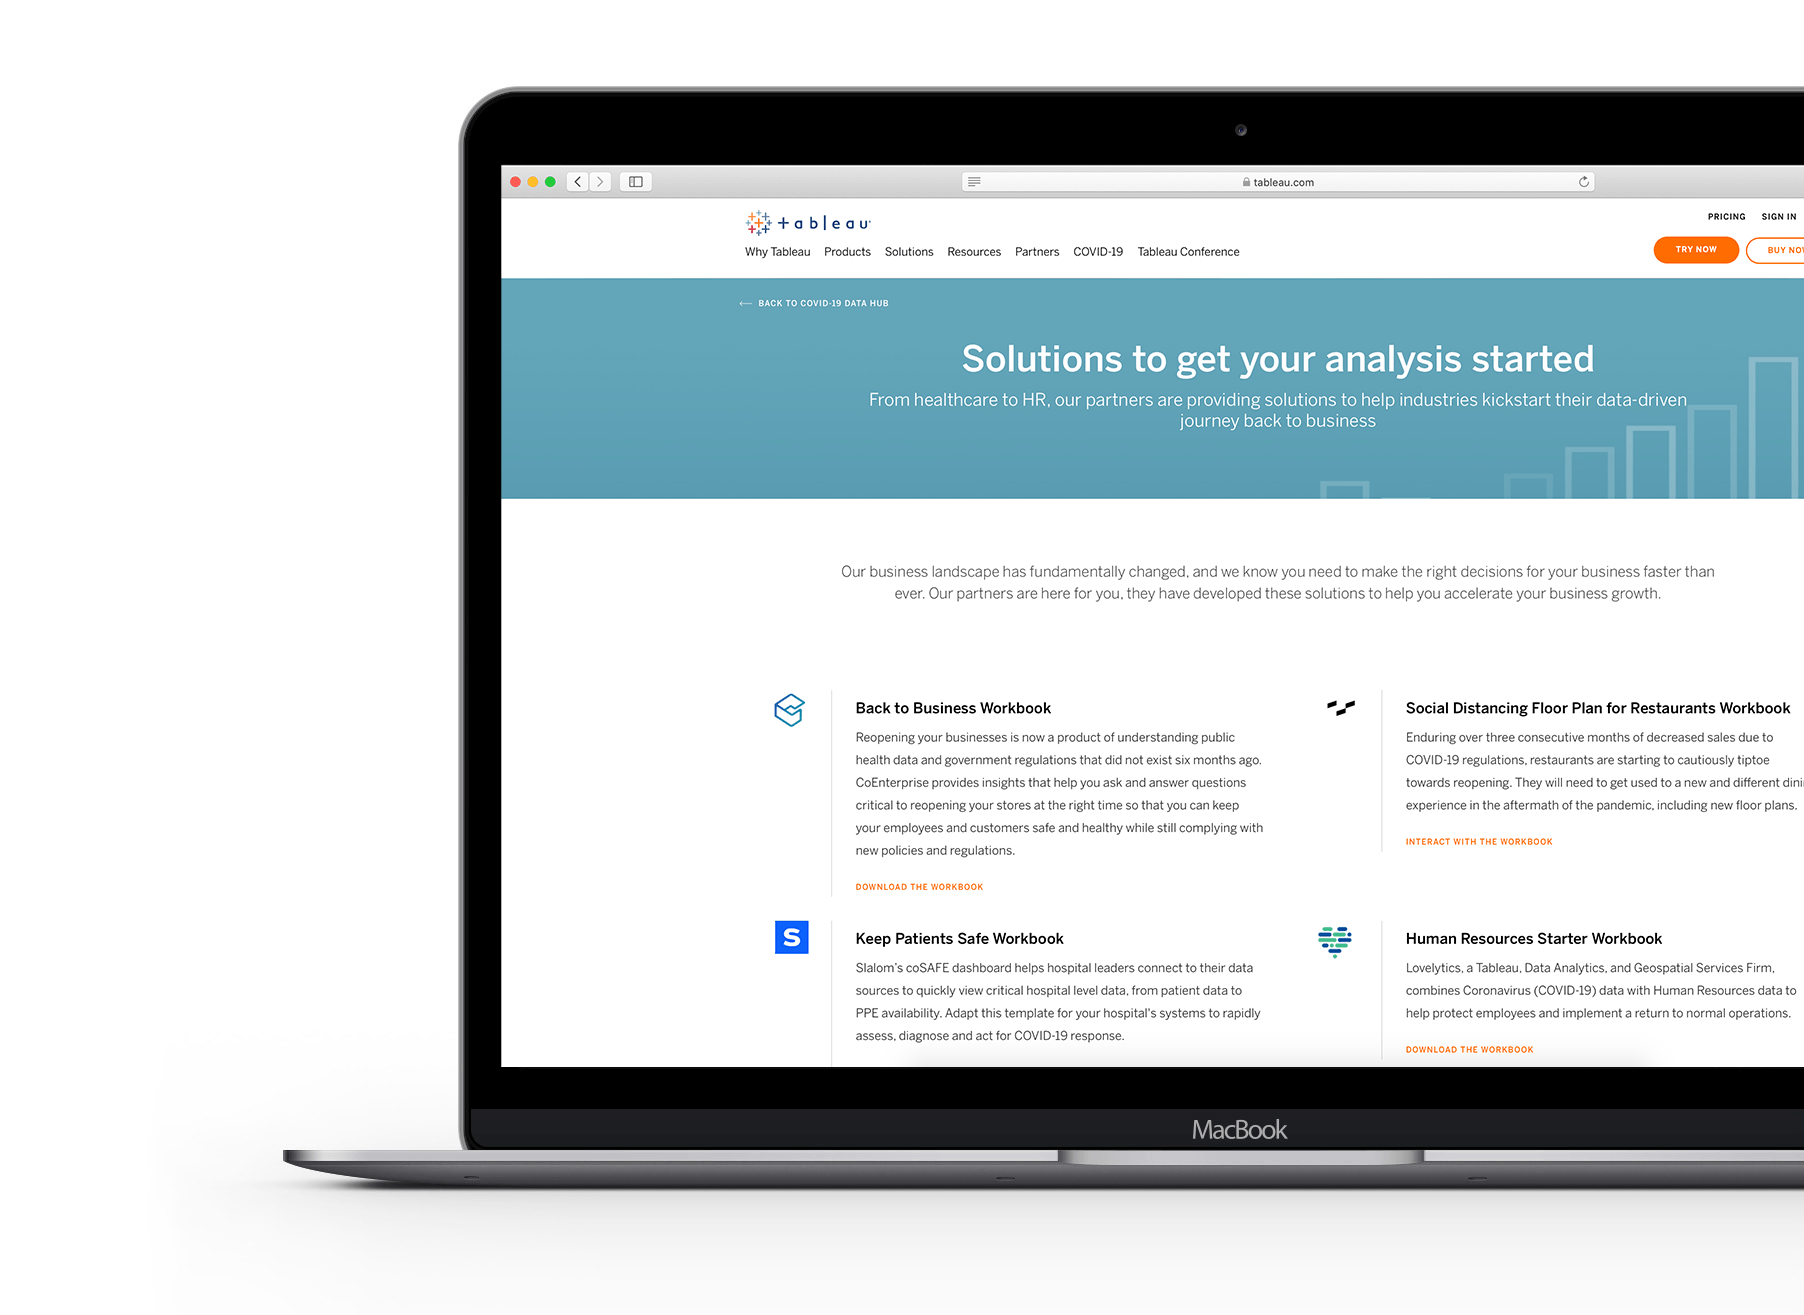 Partner Solutions Link